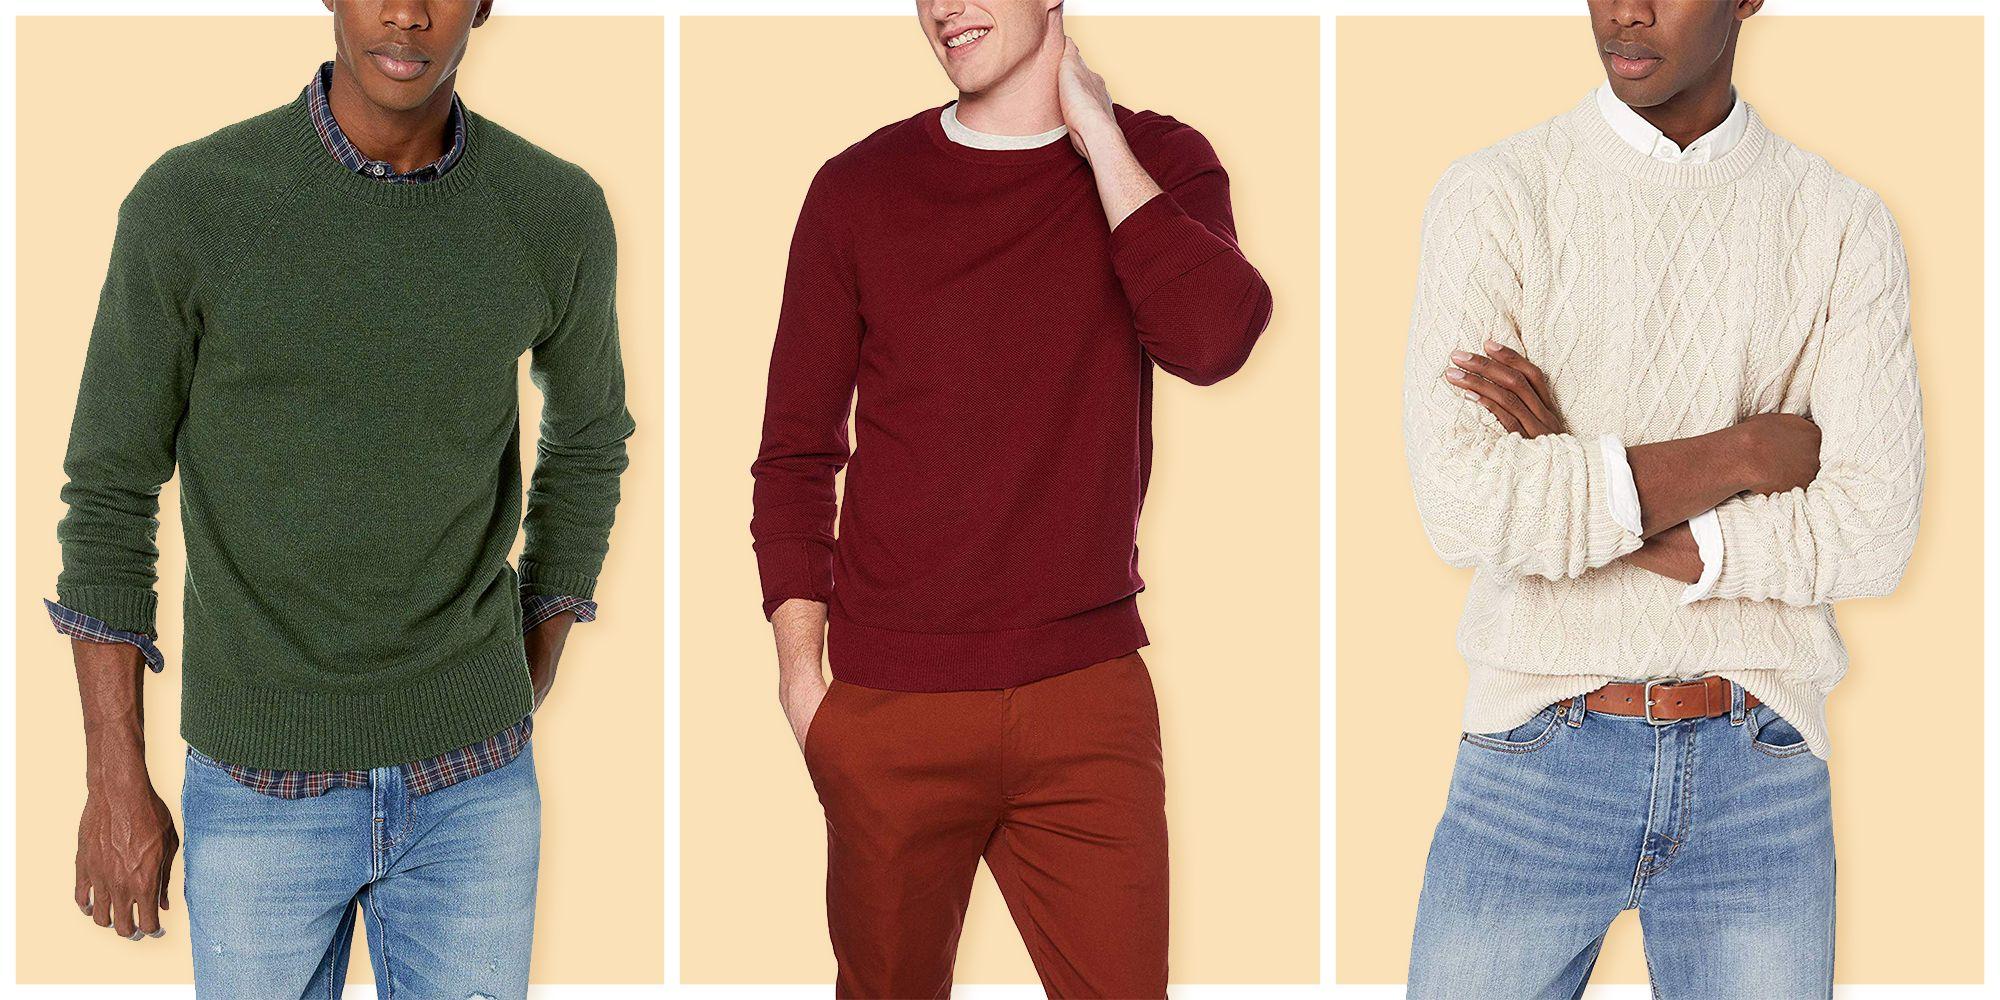 The 12 Best Wardrobe Essentials From Amazon's Massive J.Crew Mercantile Sale